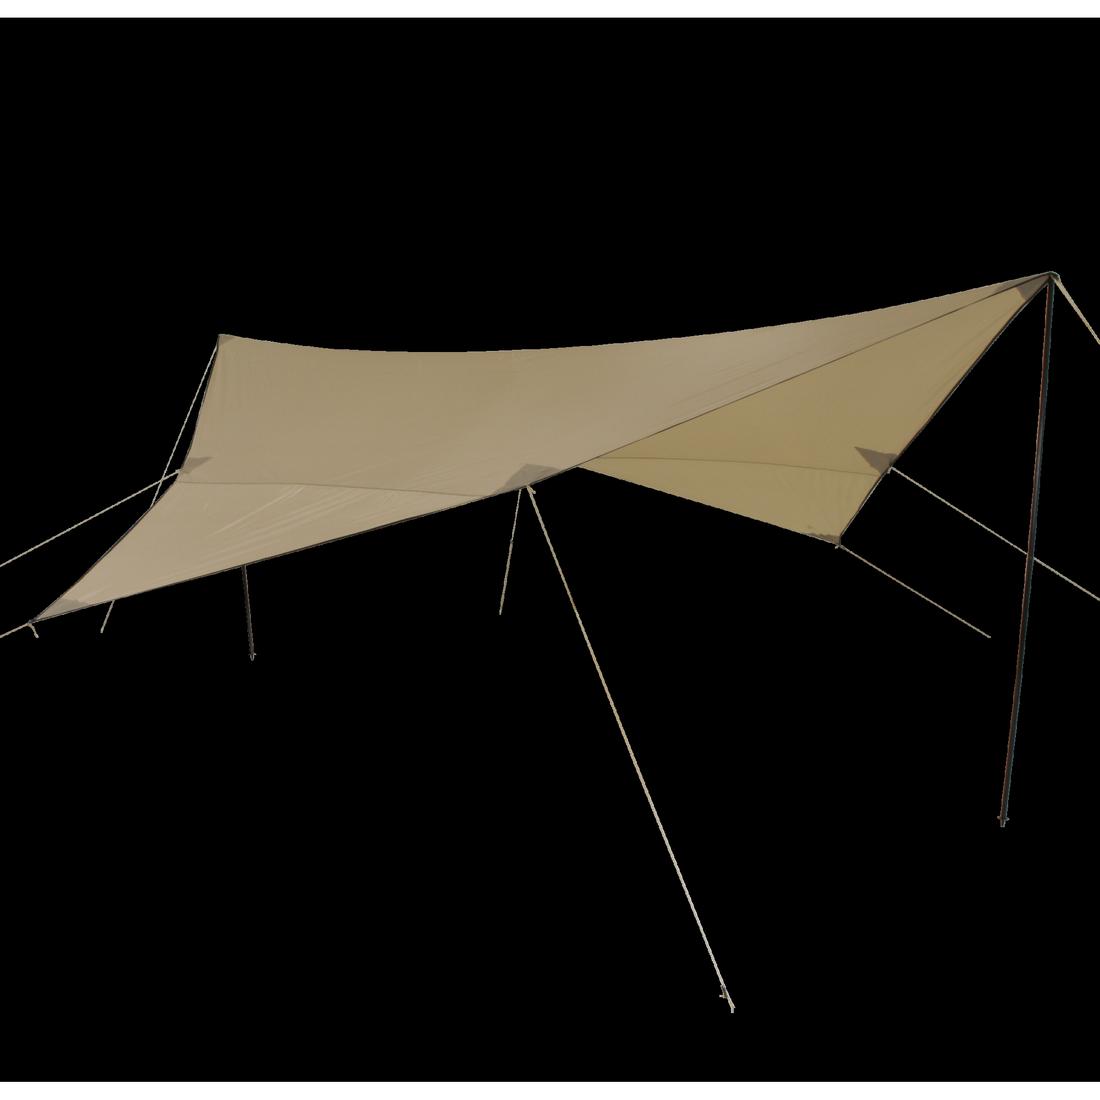 10t shade sail tarp iii 500x500 beige incl poles hh 2000mm. Black Bedroom Furniture Sets. Home Design Ideas